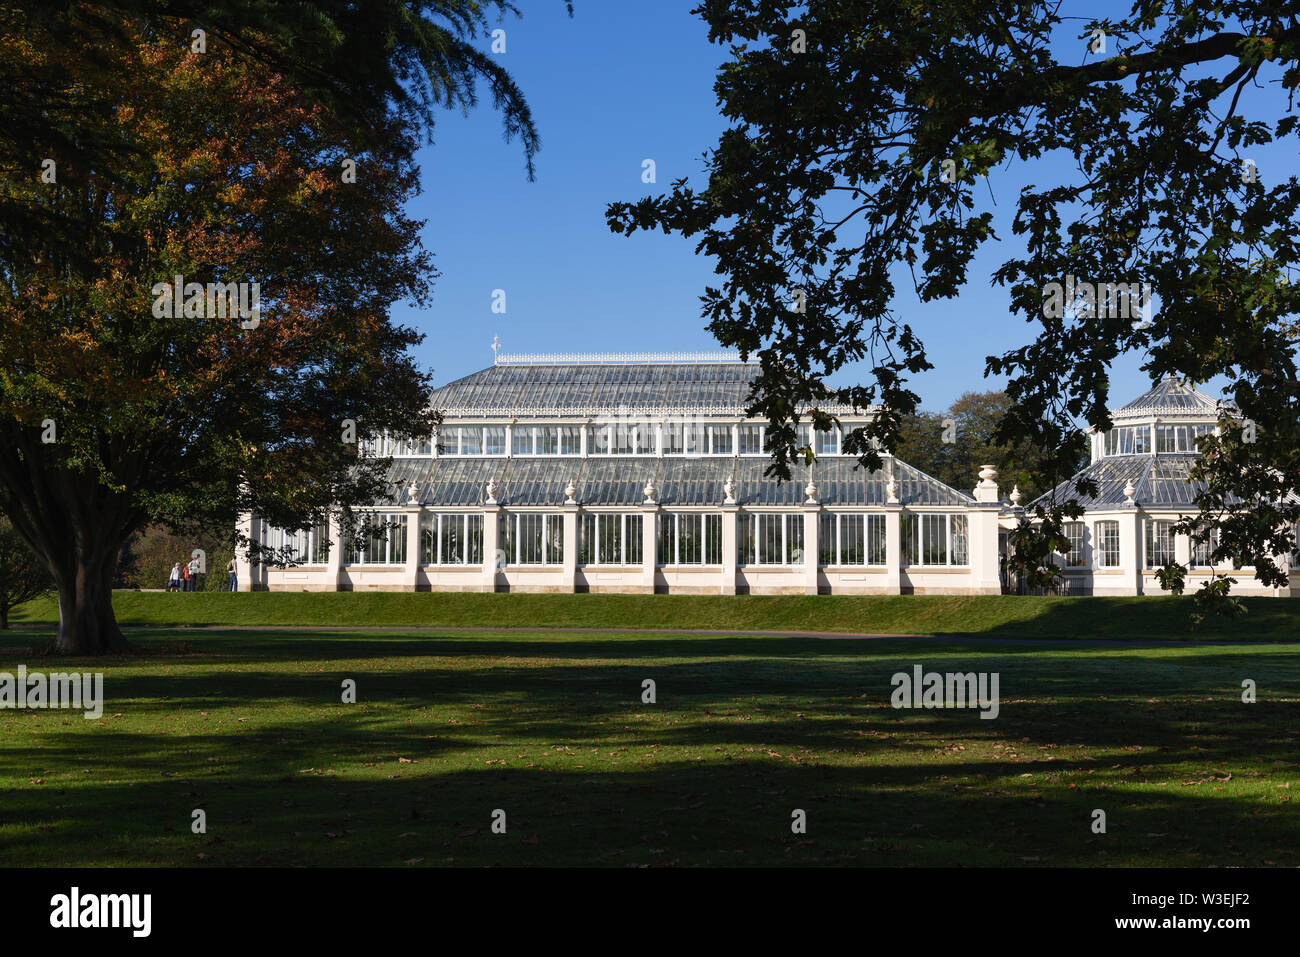 The Temperate House, Kew Gardens, London, UK - Stock Image